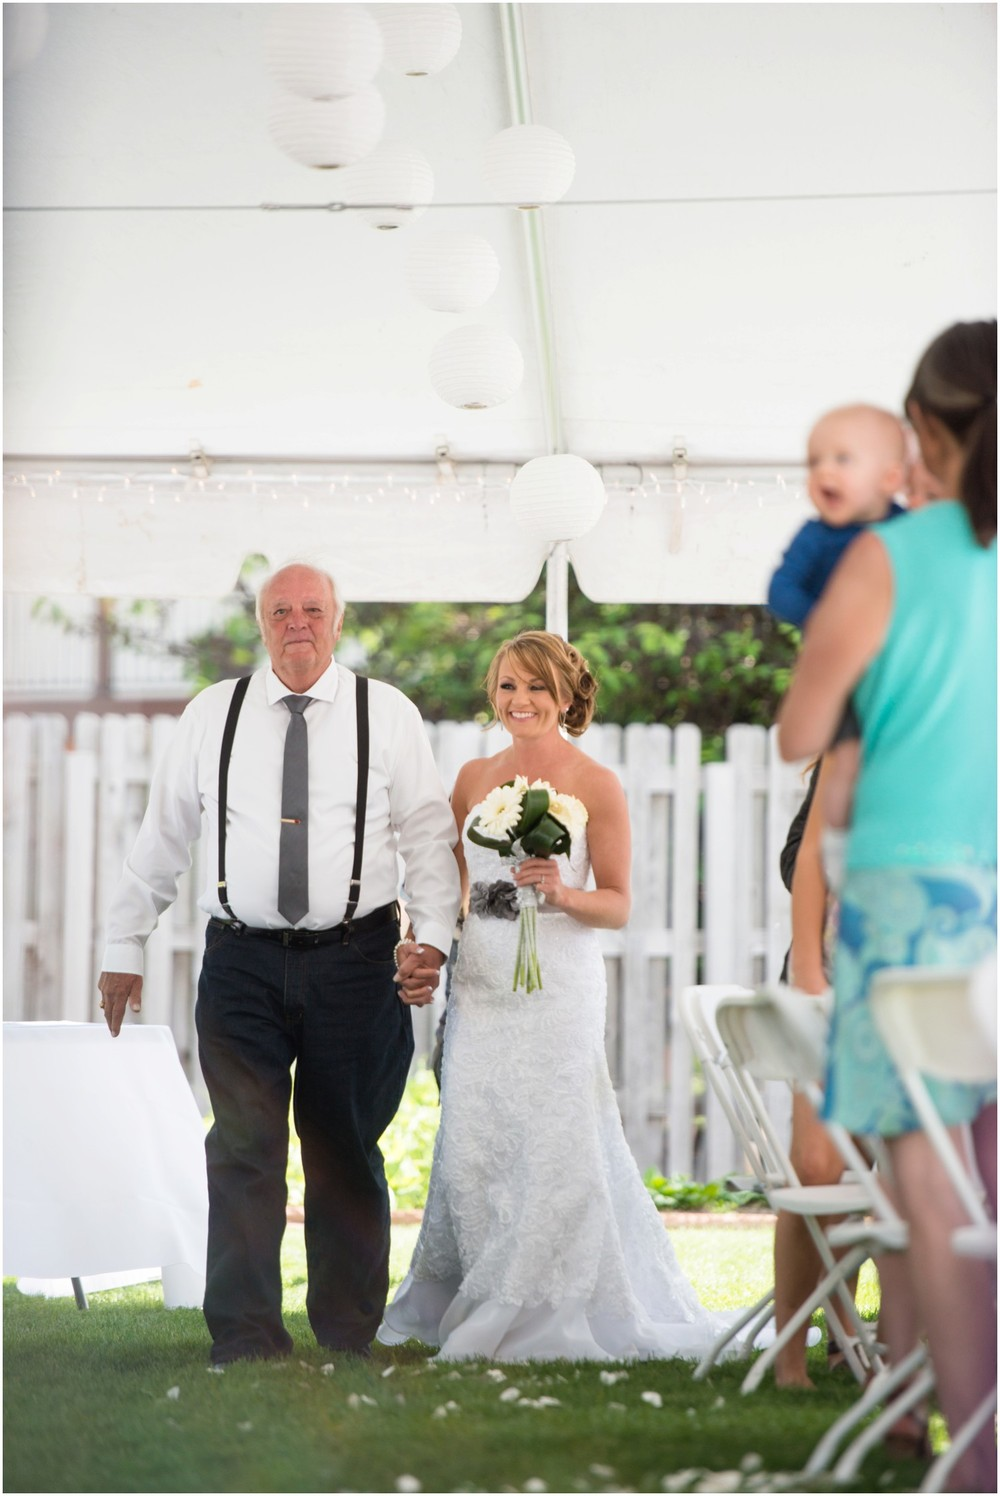 Windsor-colorado-backyard-wedding-photography-_0050.jpg